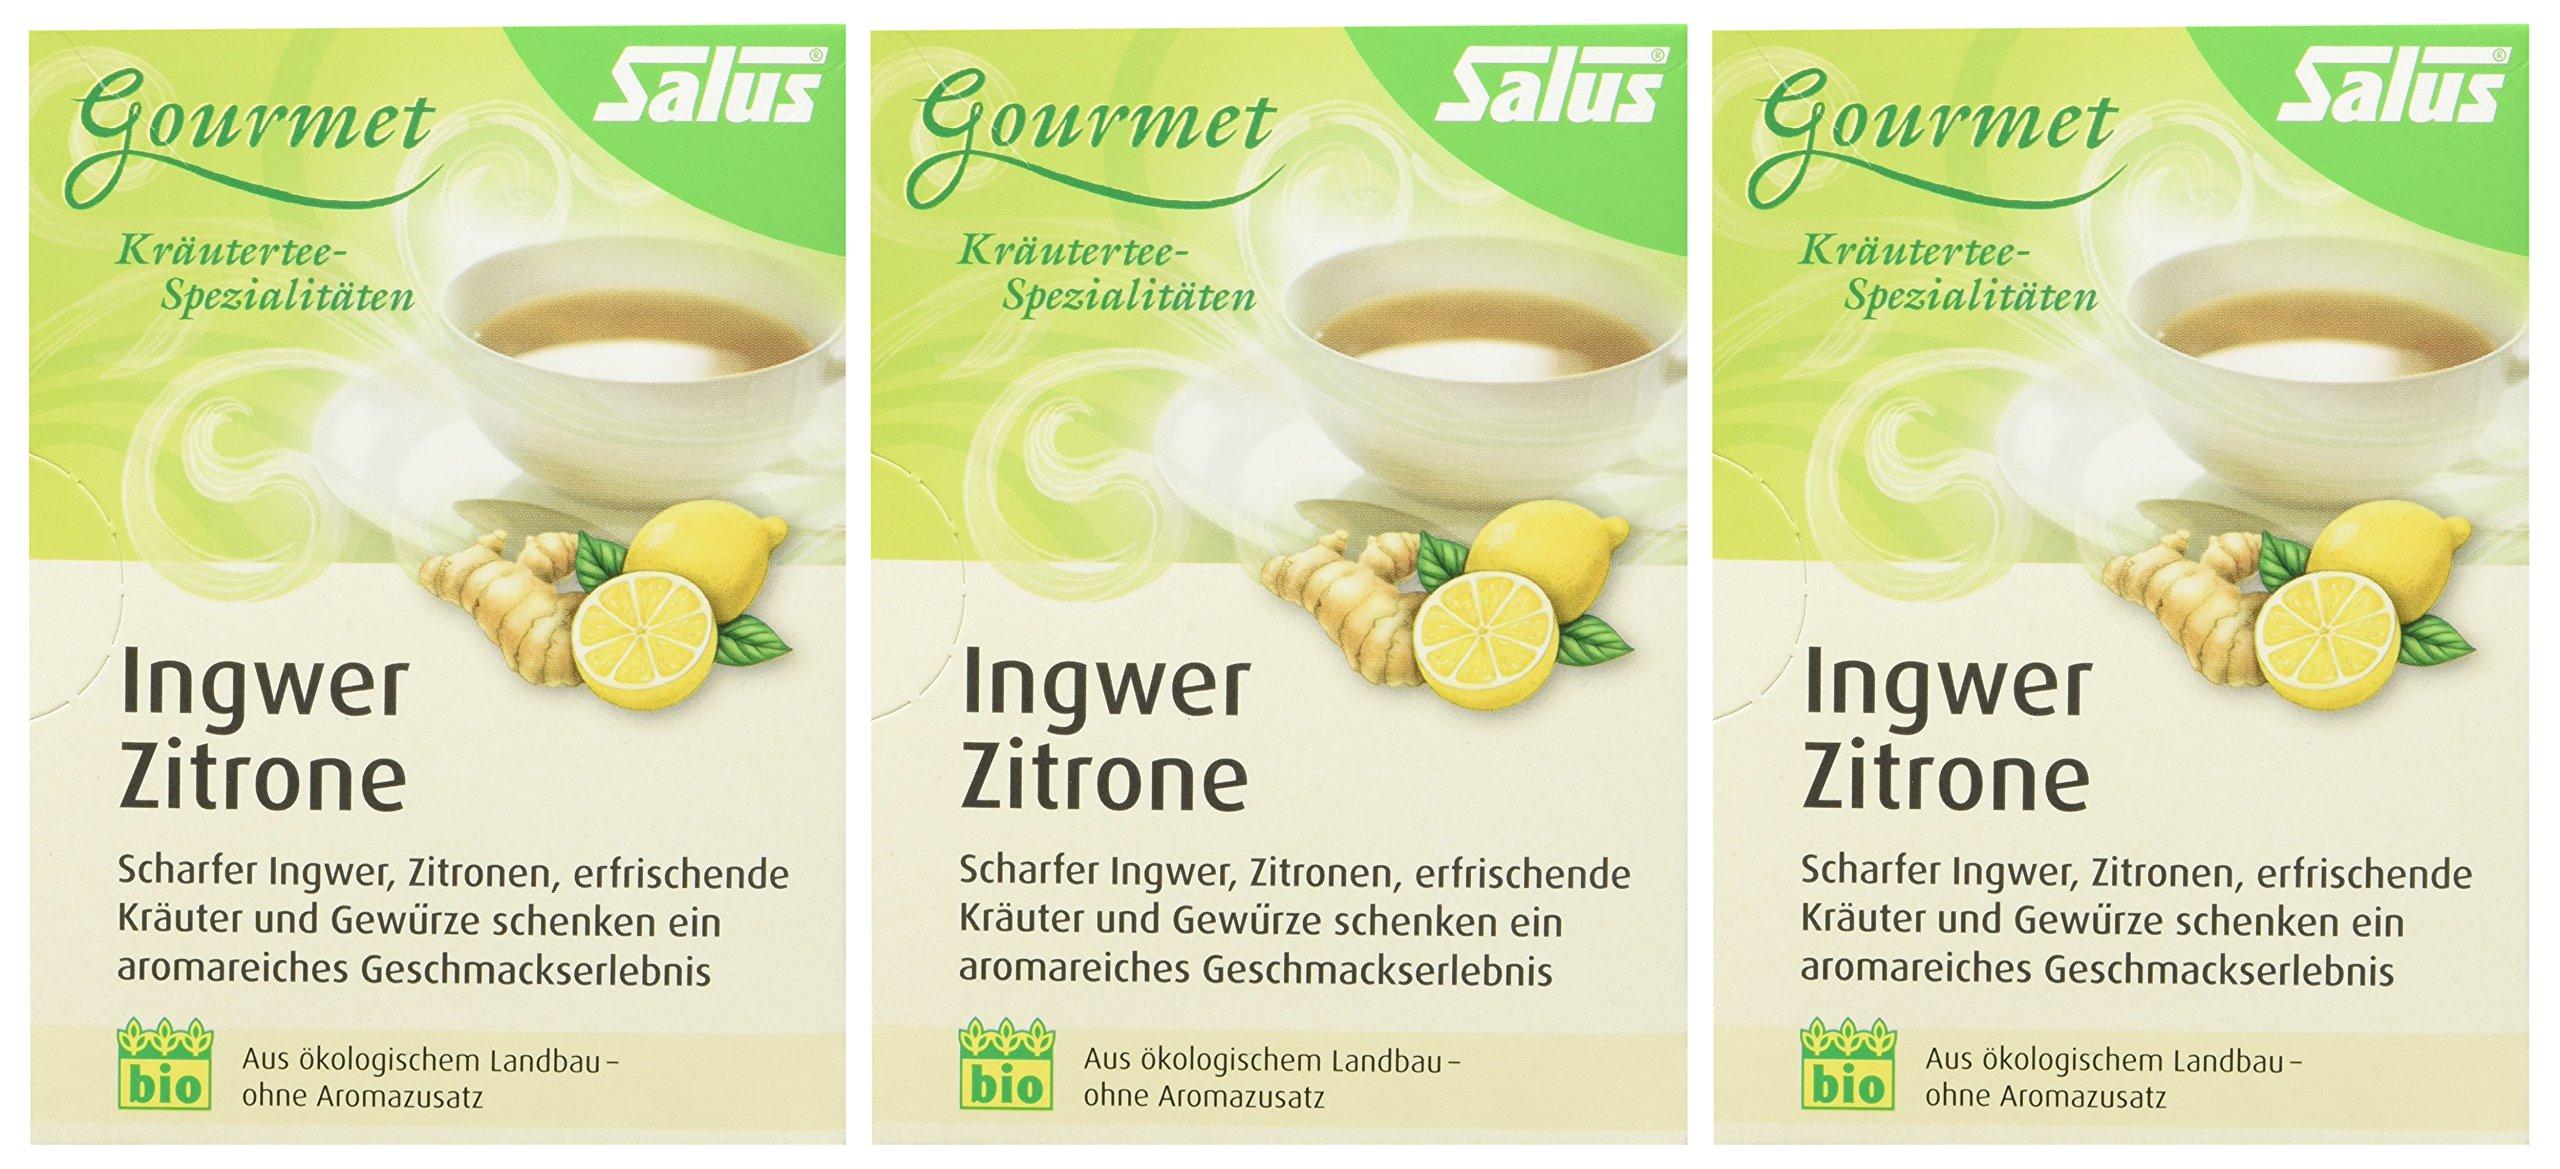 Salus-Ingwer-Zitrone-Kruter-Frchtetee-3er-Pack-3-x-30-g